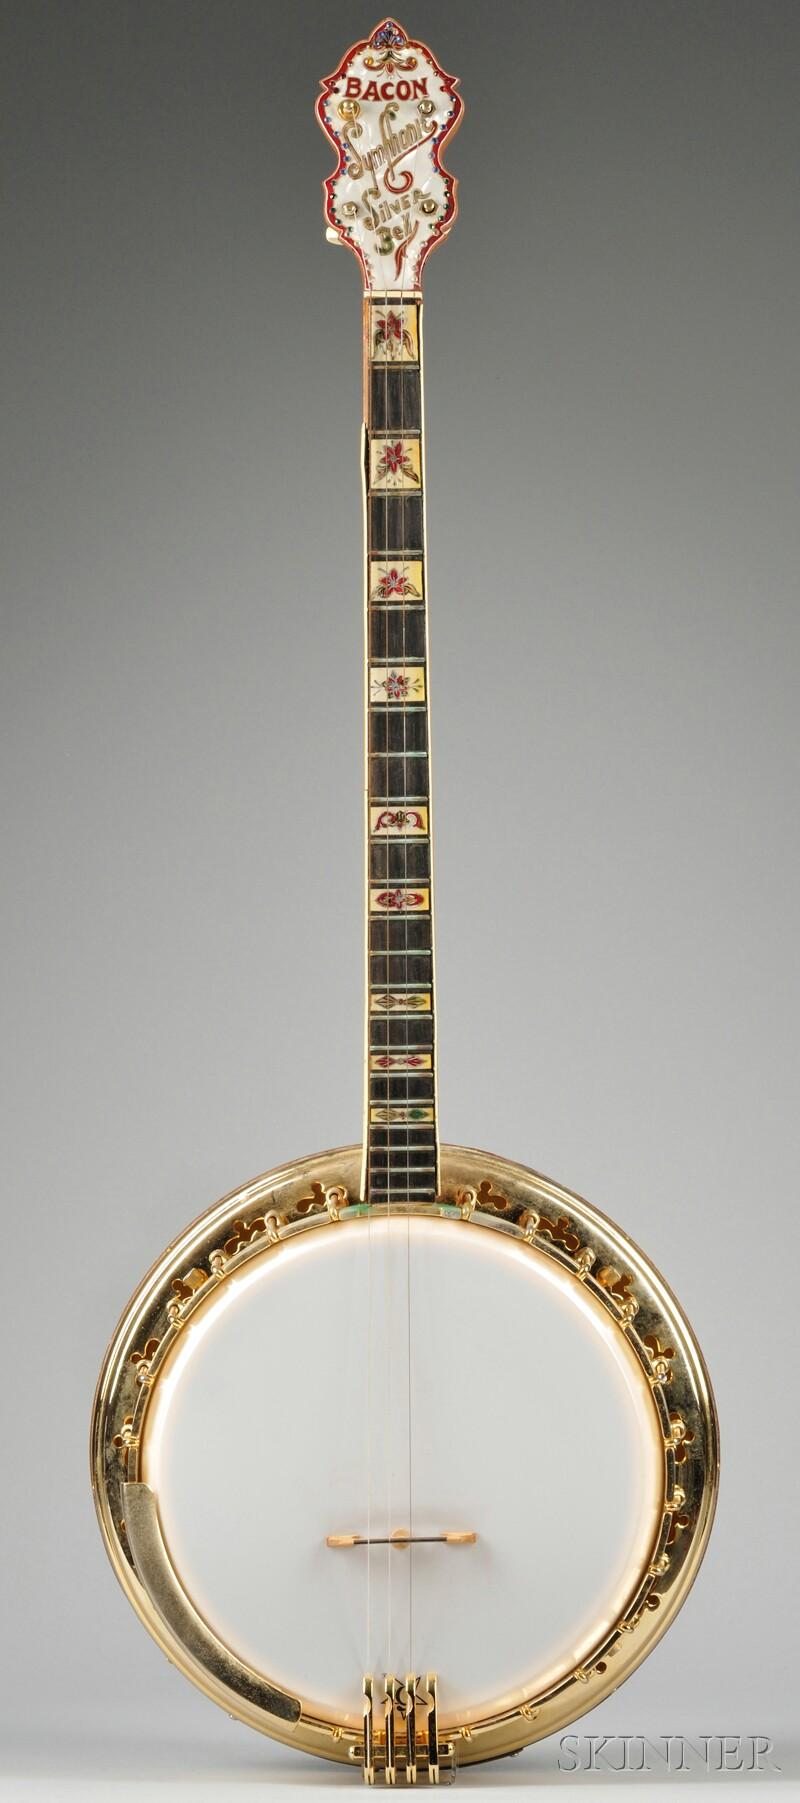 American Tenor Banjo, Bacon Manufacturing Company, Groton, c. 1940, Model Silver Bel